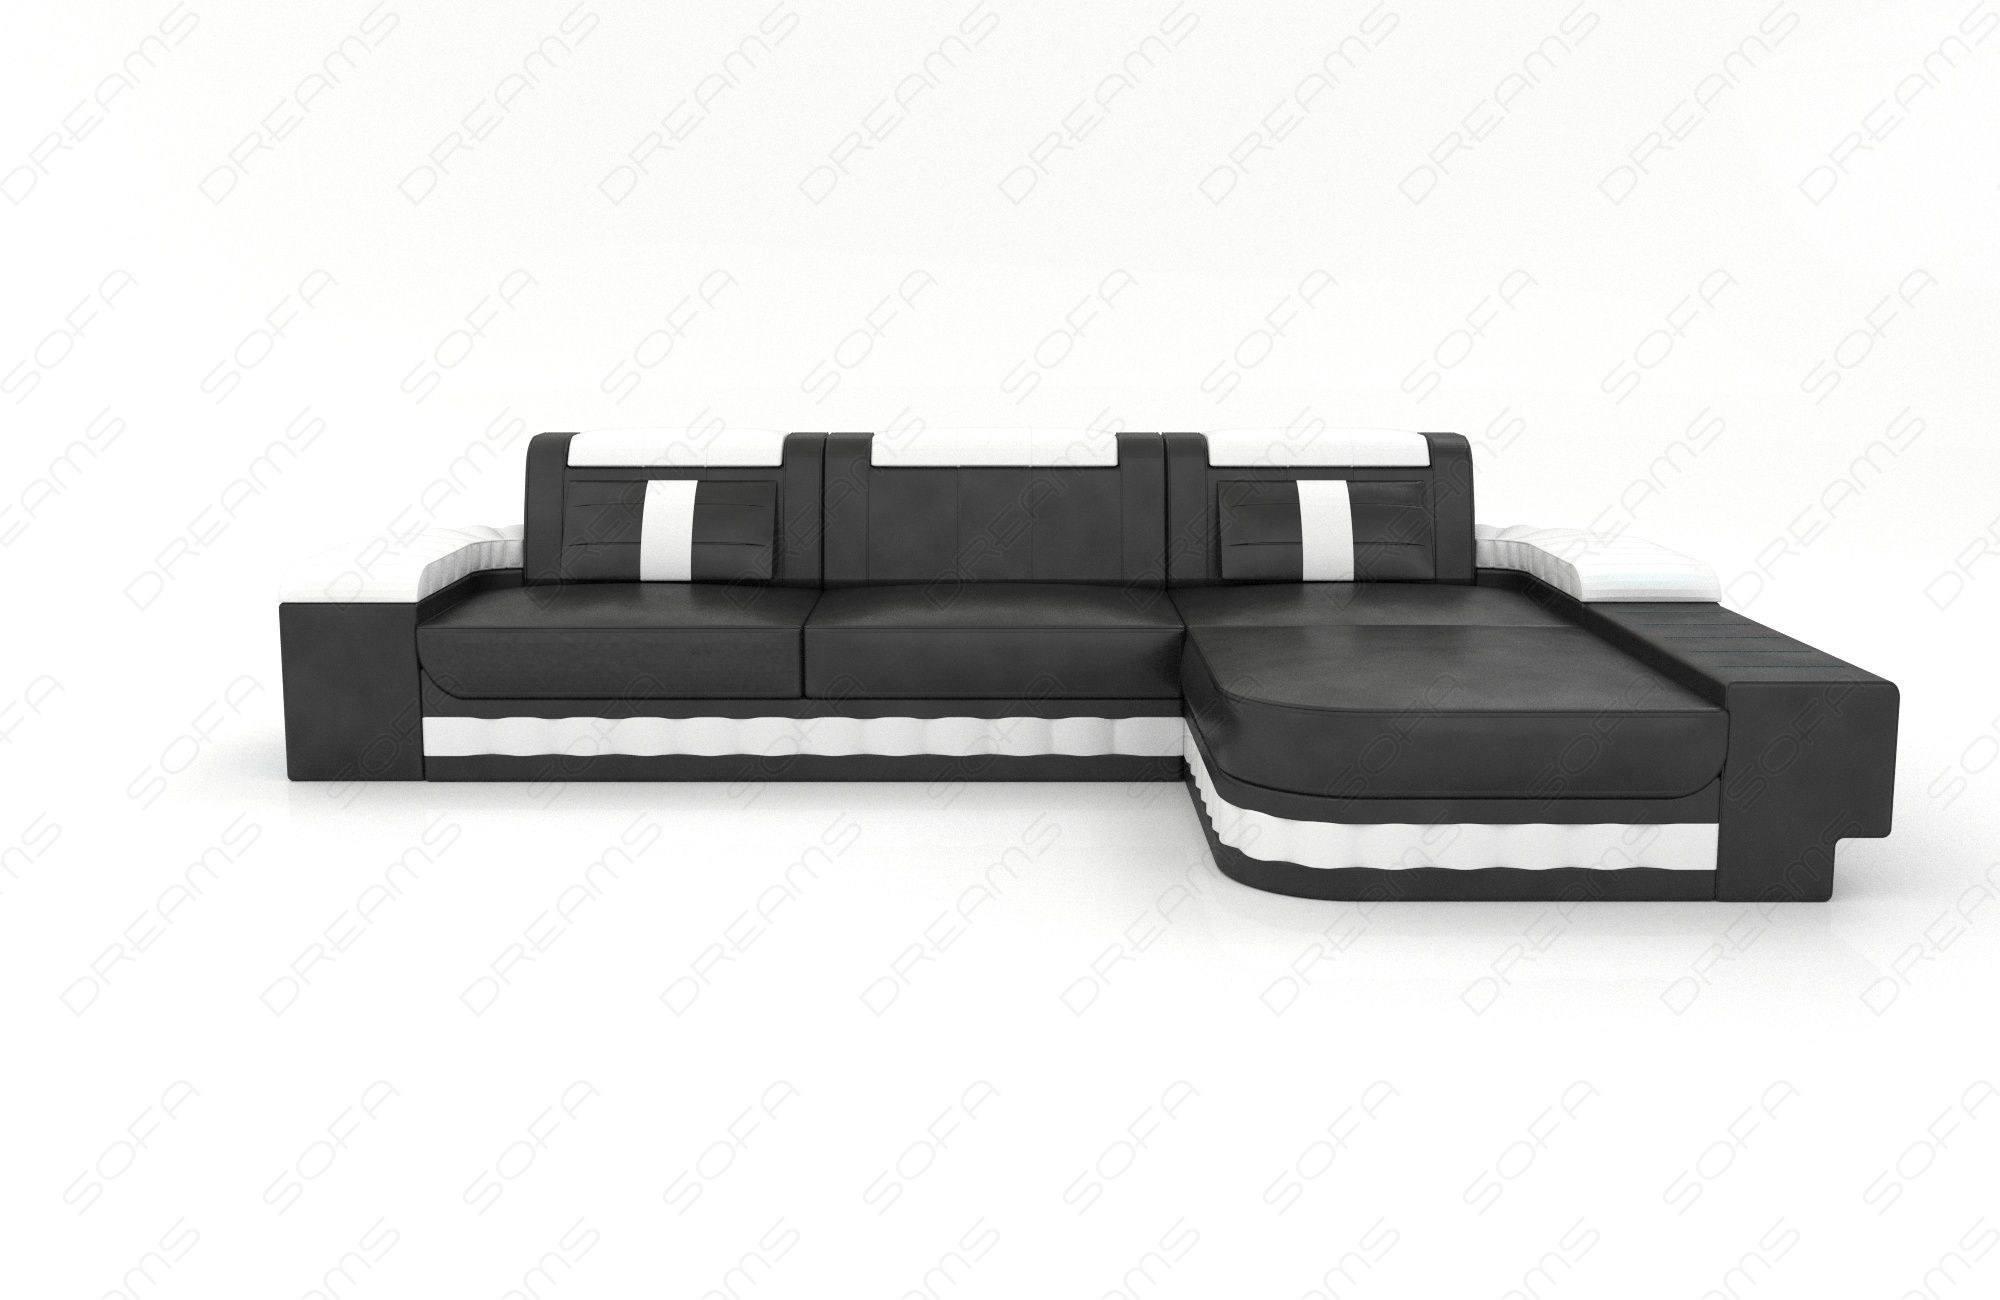 mega sectional fabric sofa boston l with led. Black Bedroom Furniture Sets. Home Design Ideas